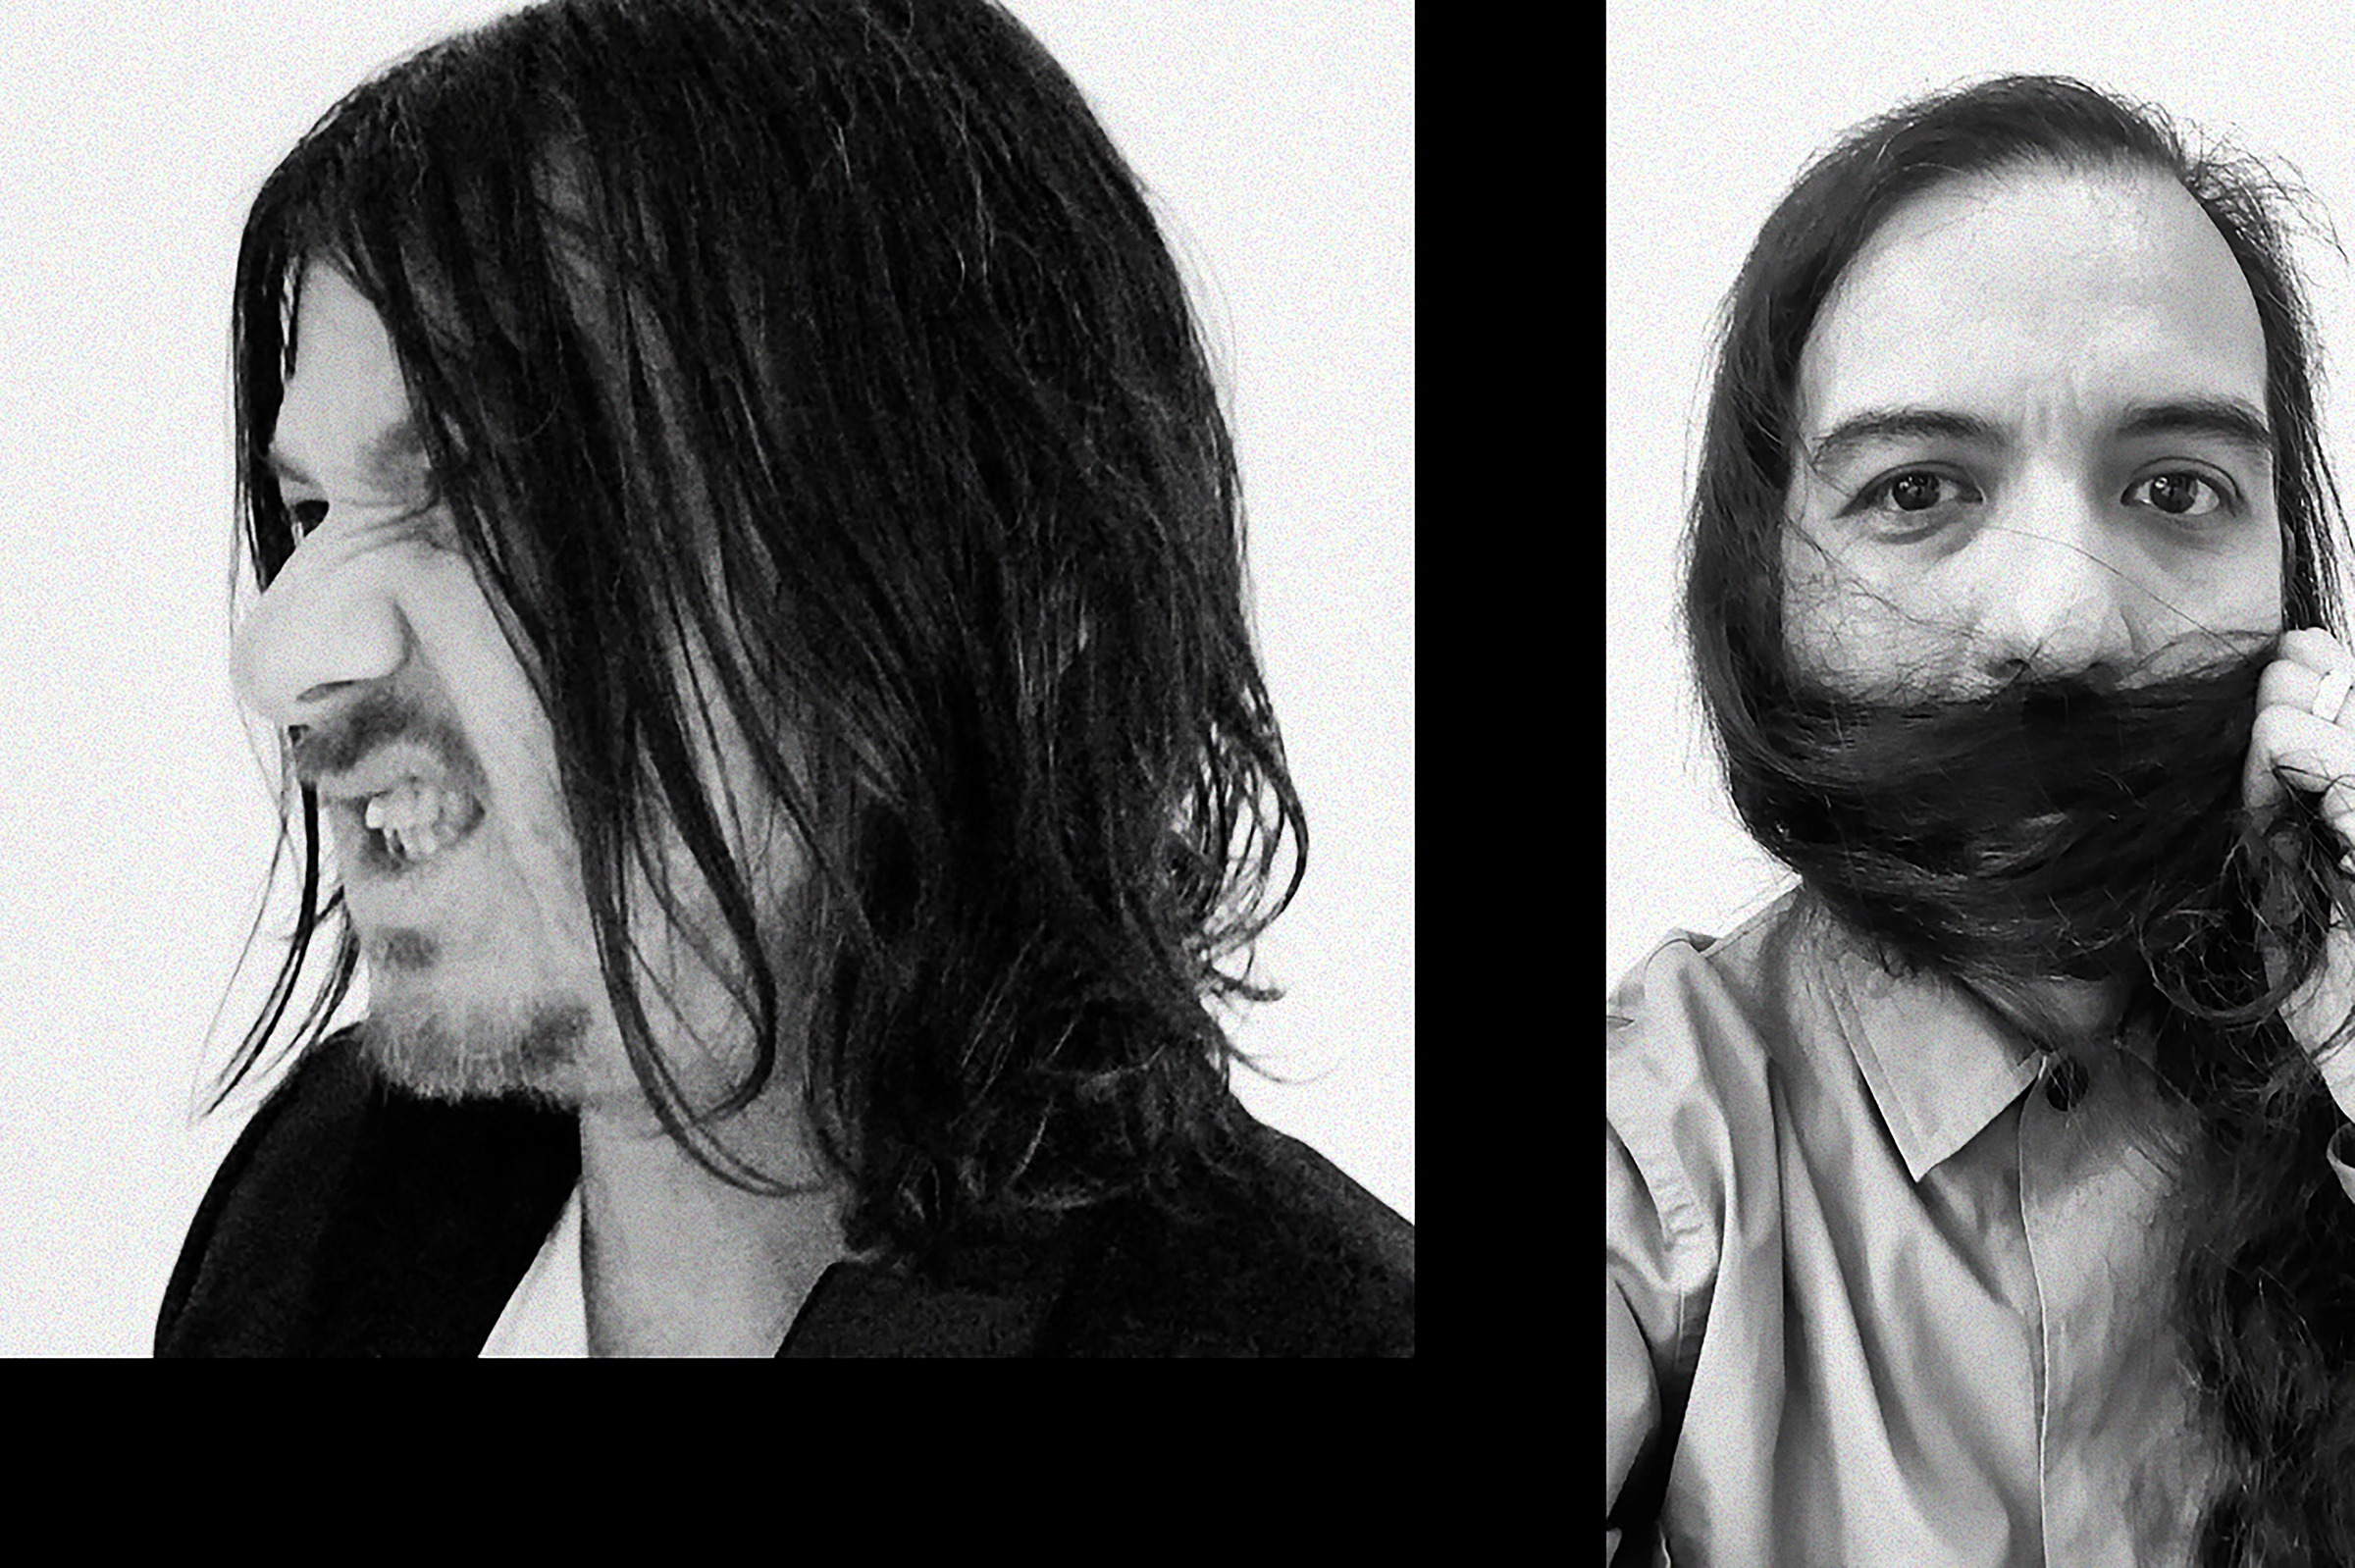 SECRET MACHINES announce new LP 'Awake in the Brain Chamber' - Hear new single 'Talos' Corpse' 1